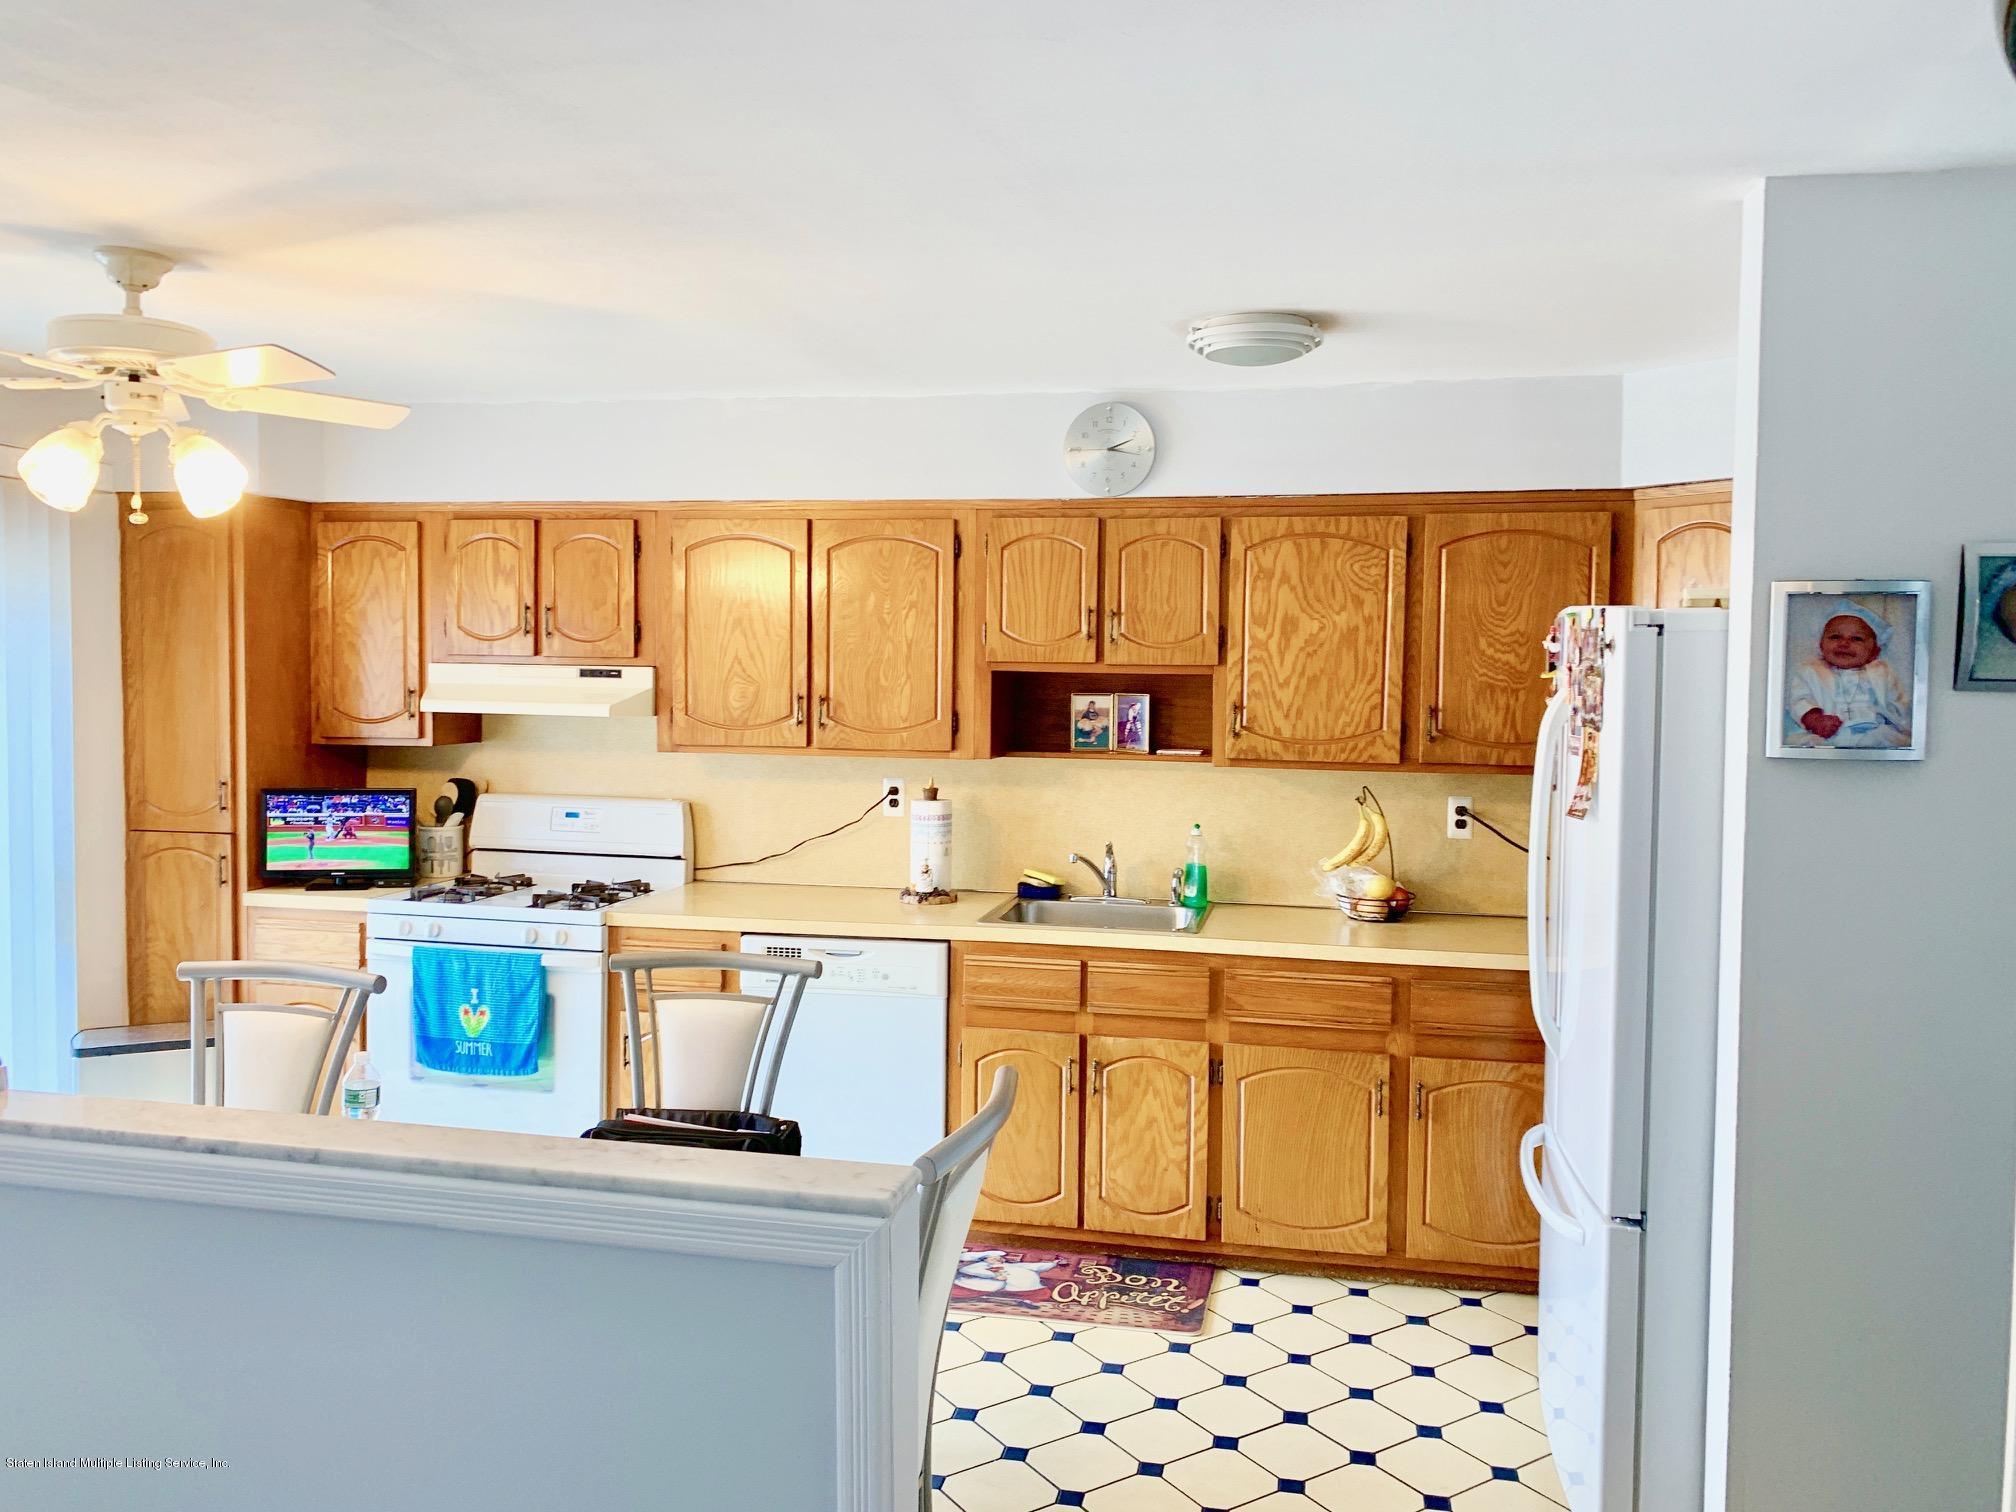 Single Family - Attached 99 Cedar Grove   Staten Island, NY 10306, MLS-1132231-3